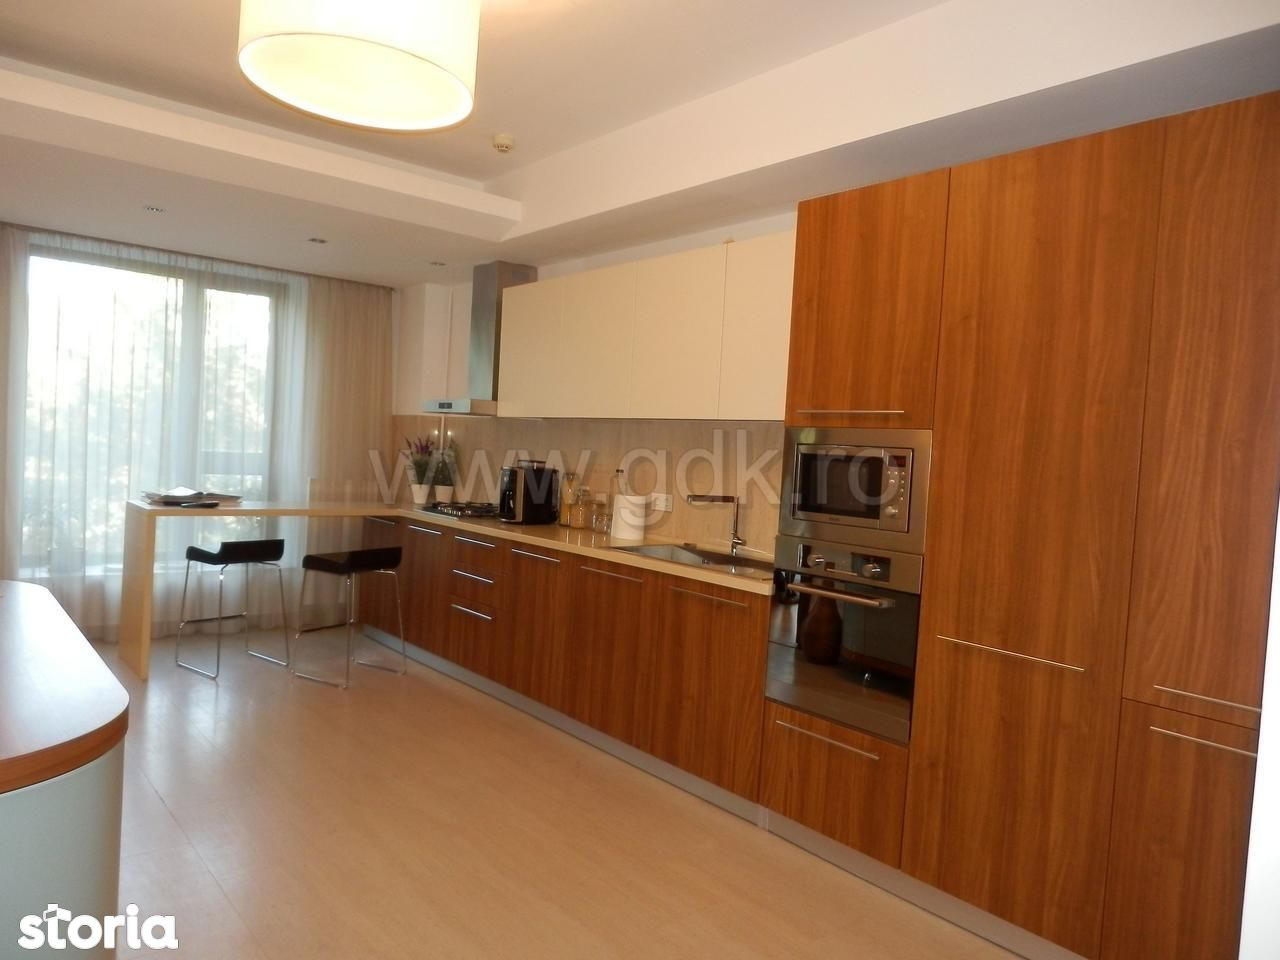 Apartament de inchiriat, București (judet), Strada Gen. Av. Athanasie Enescu - Foto 5